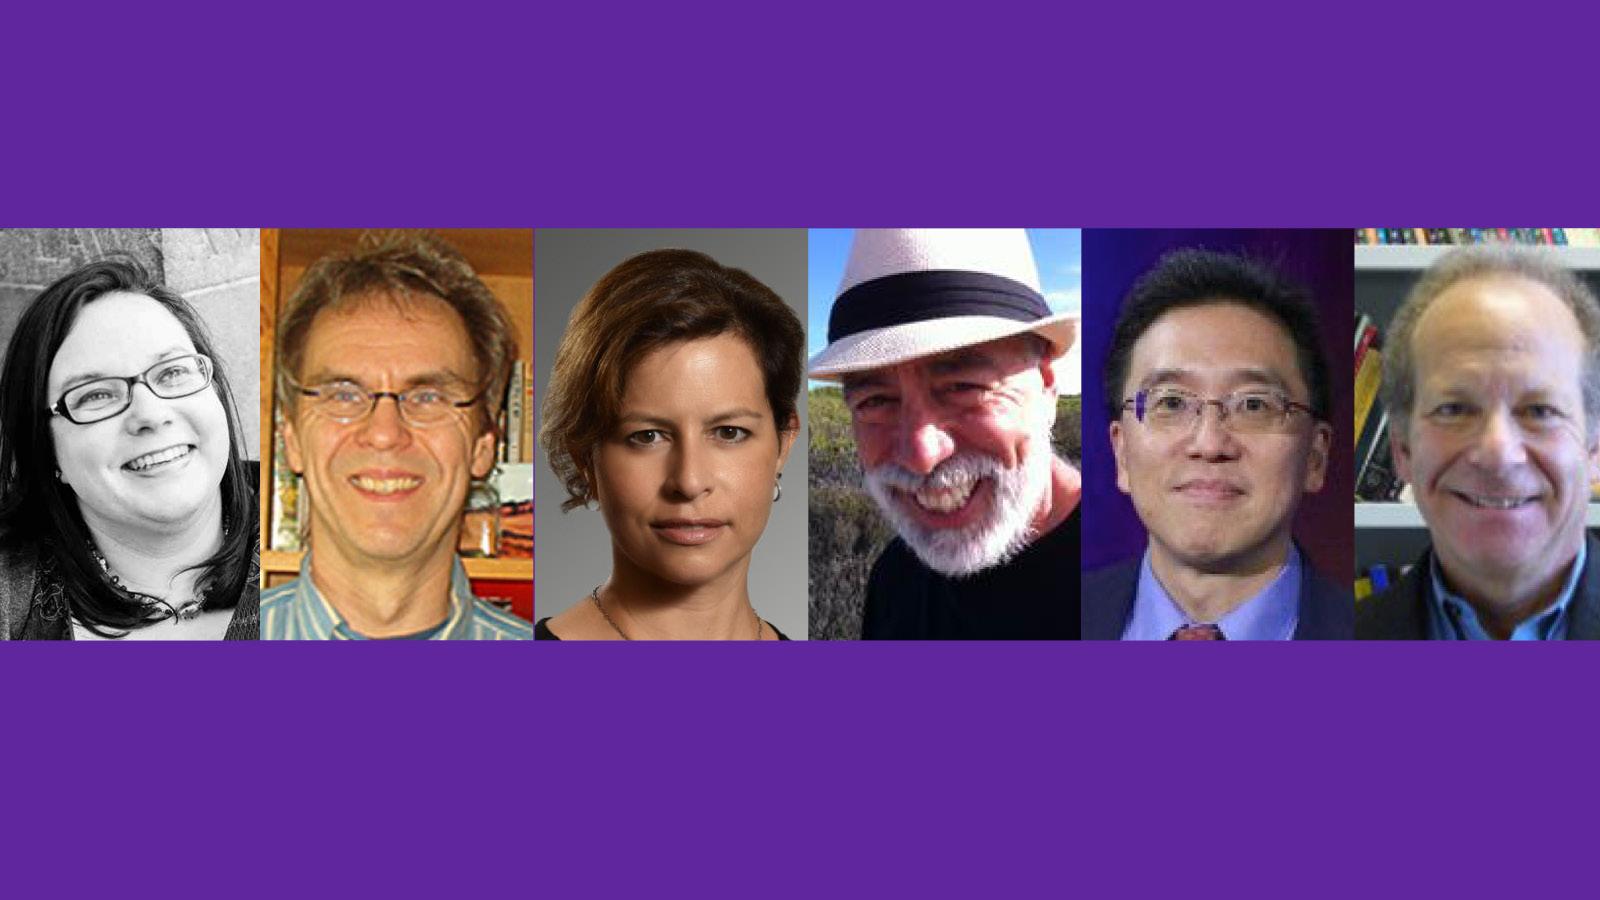 (From left) Erin Mayo-Adam, Rodger Karapin, Lina Newton, Sanford Schram, Charles Tien and John R. Wallach